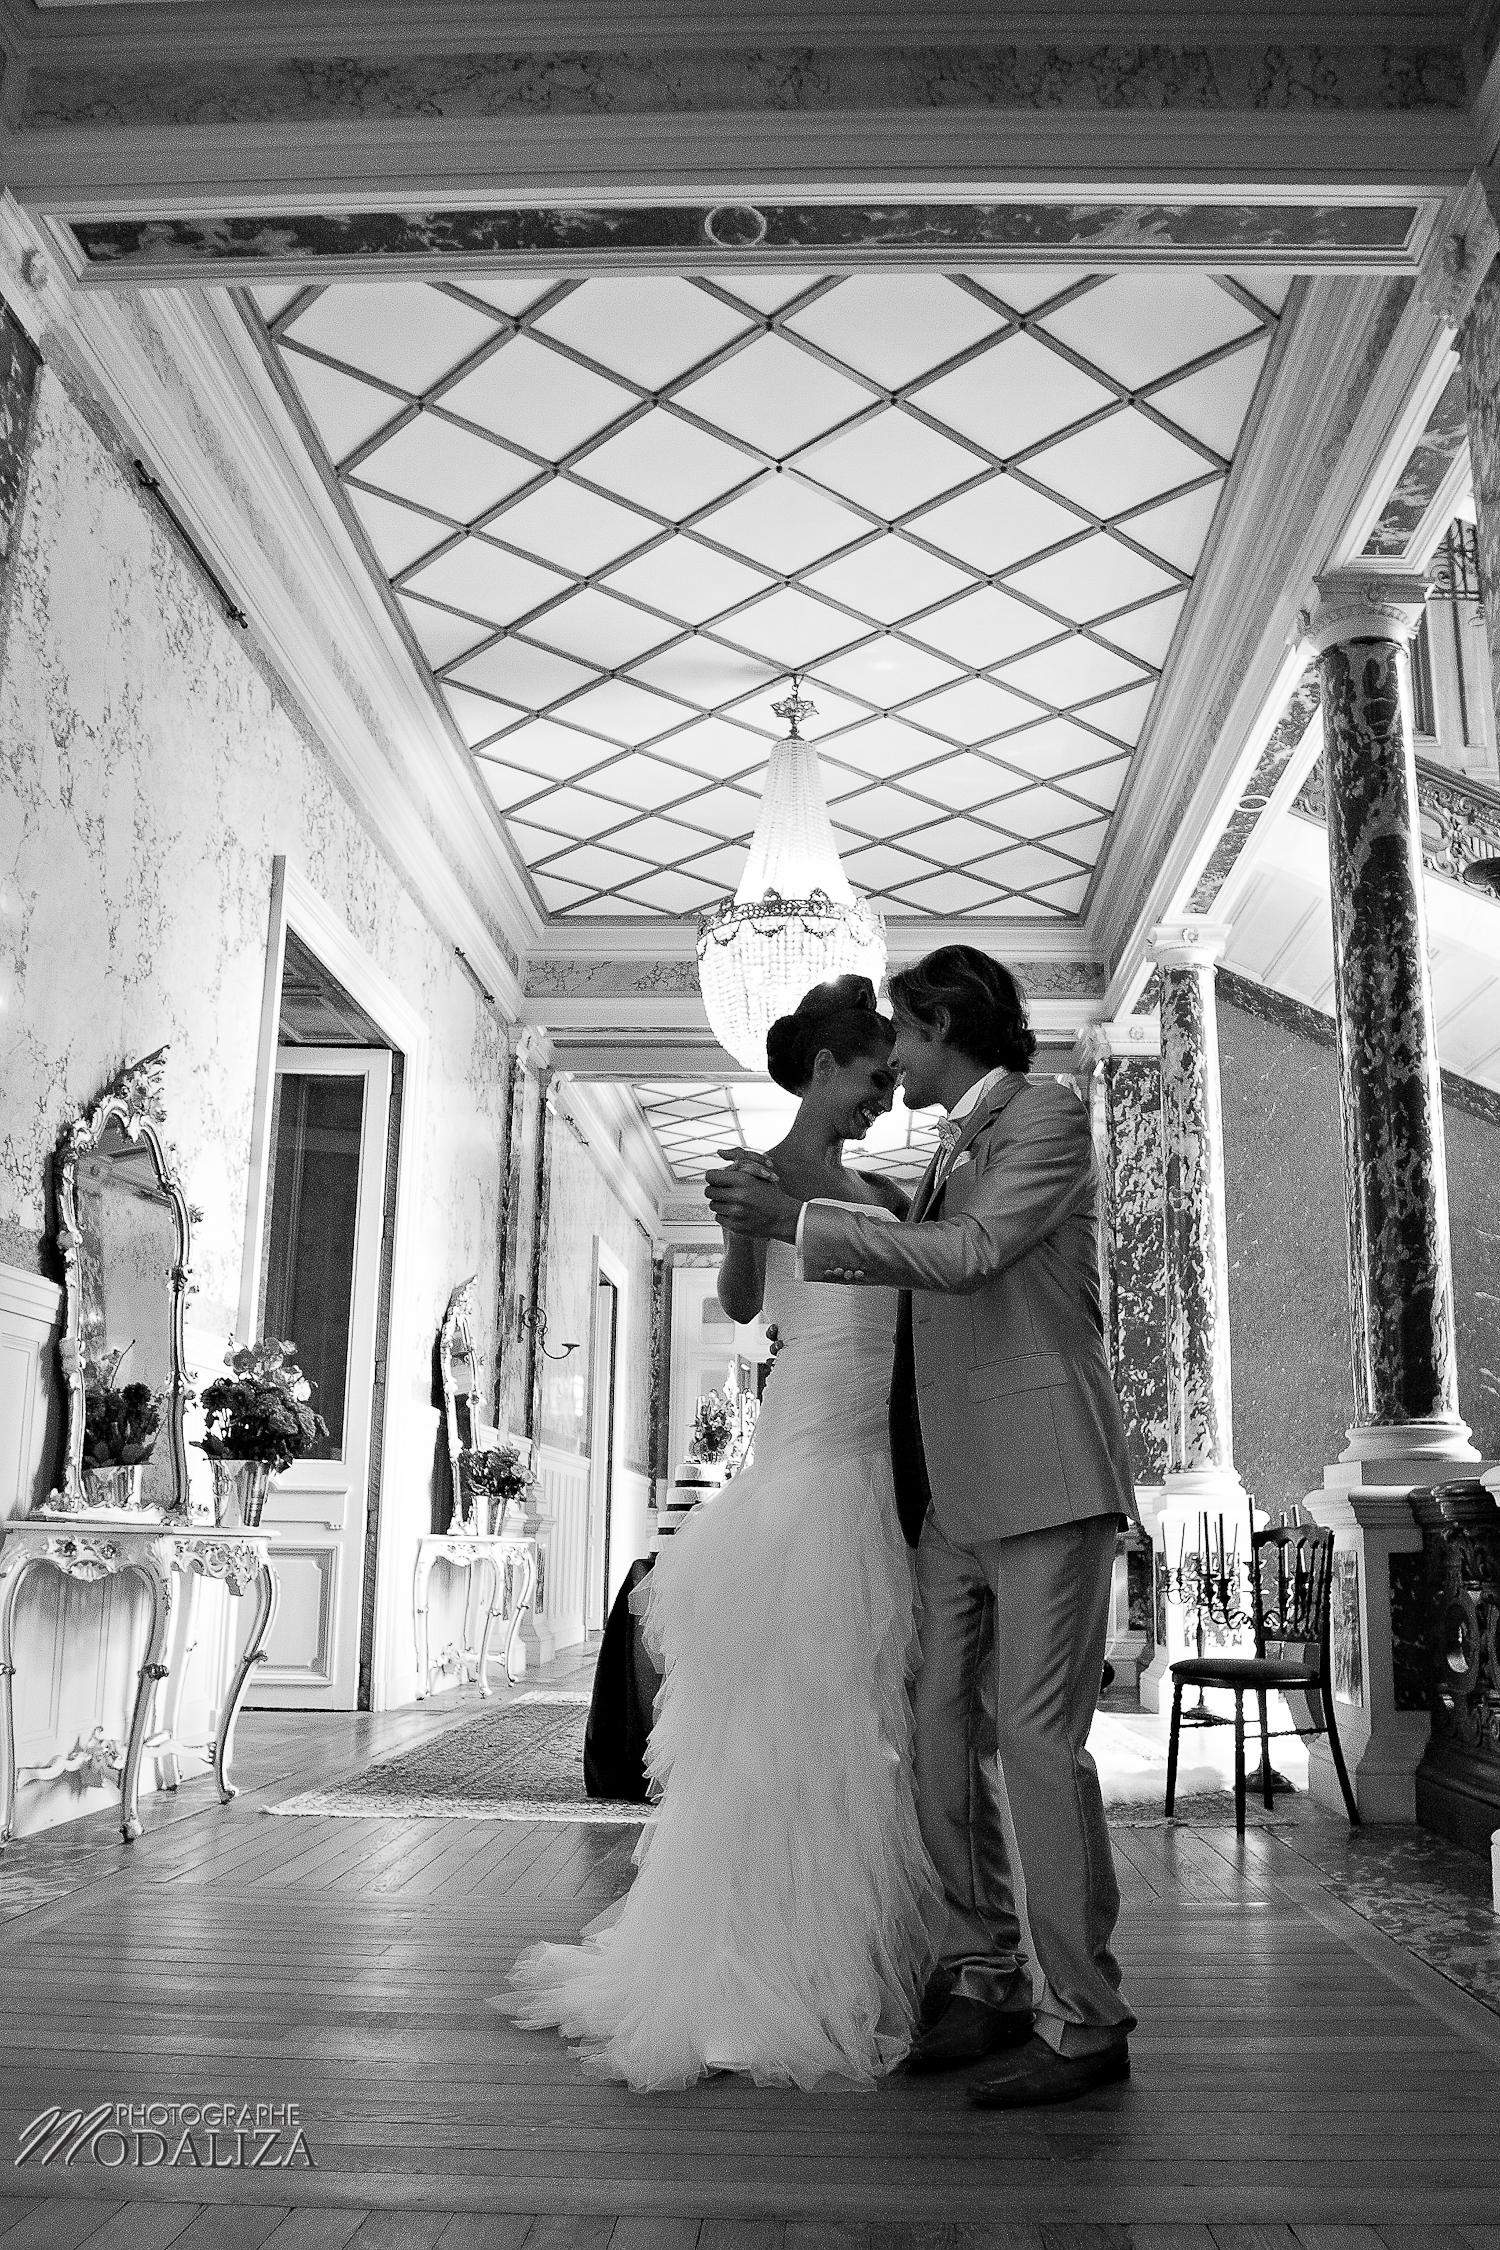 photo mode inspiration mariage decoration argent noir violet wedding bride mariée marié groom danse baroque rock fashion chateau grenade castle gironde by modaliza-0674